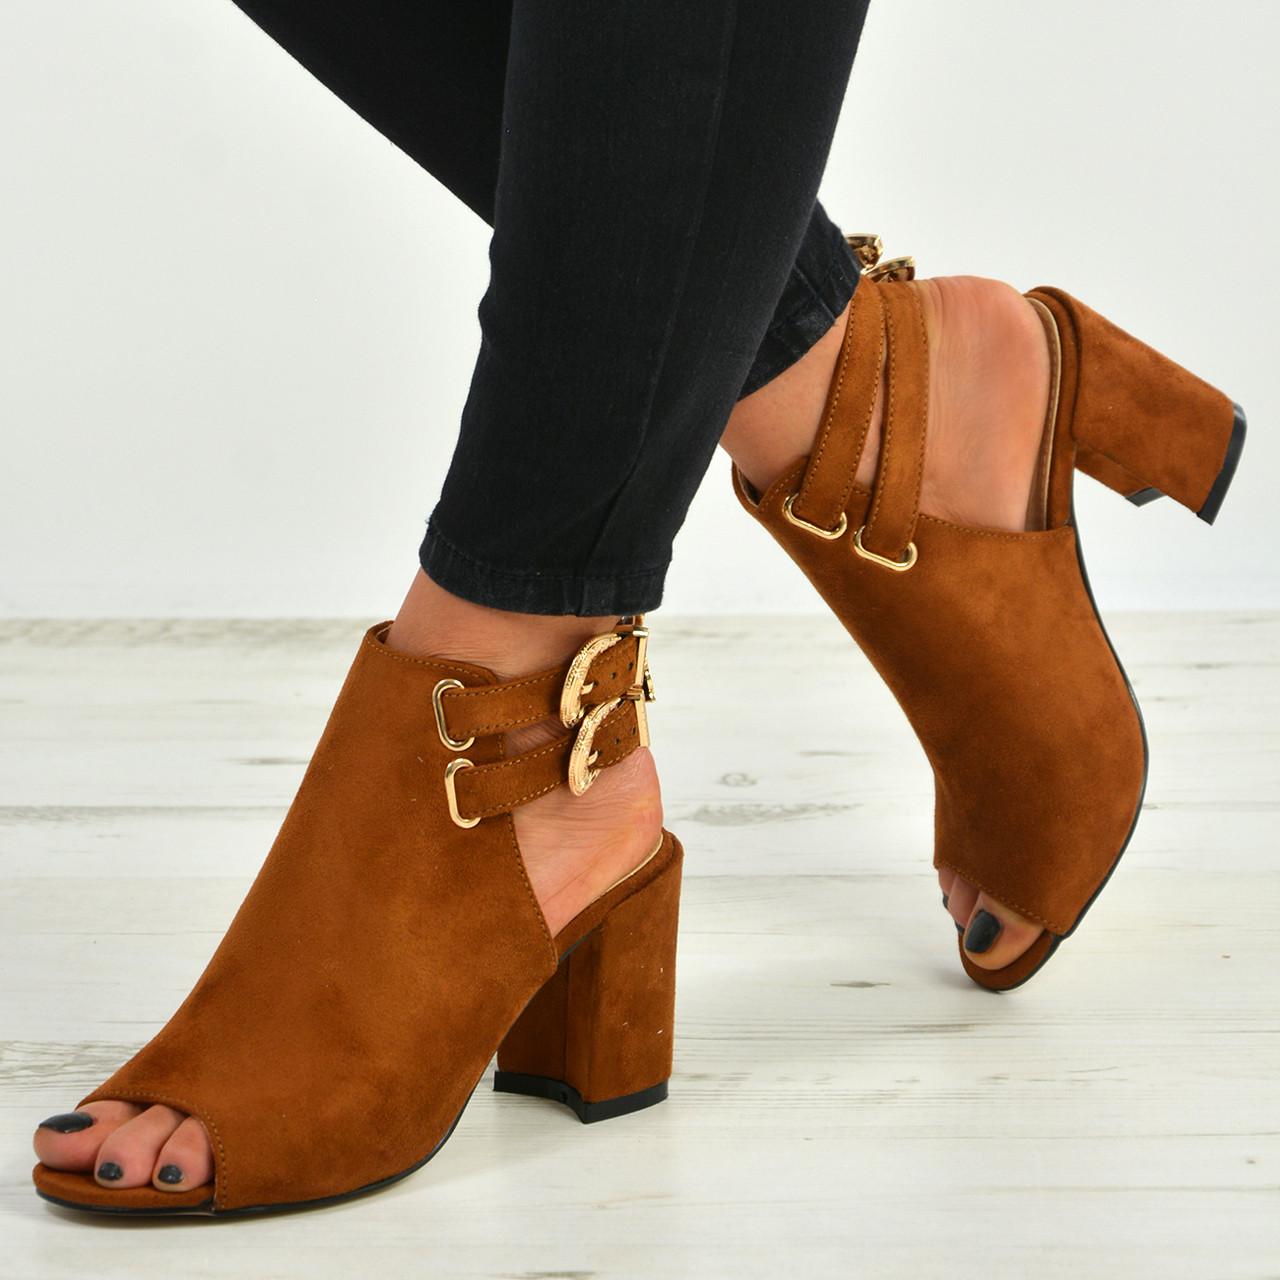 e5baa110b New Womens Ladies Ankle Strap Block Heels Peep Toe Sandals Shoes Size Uk 3-8